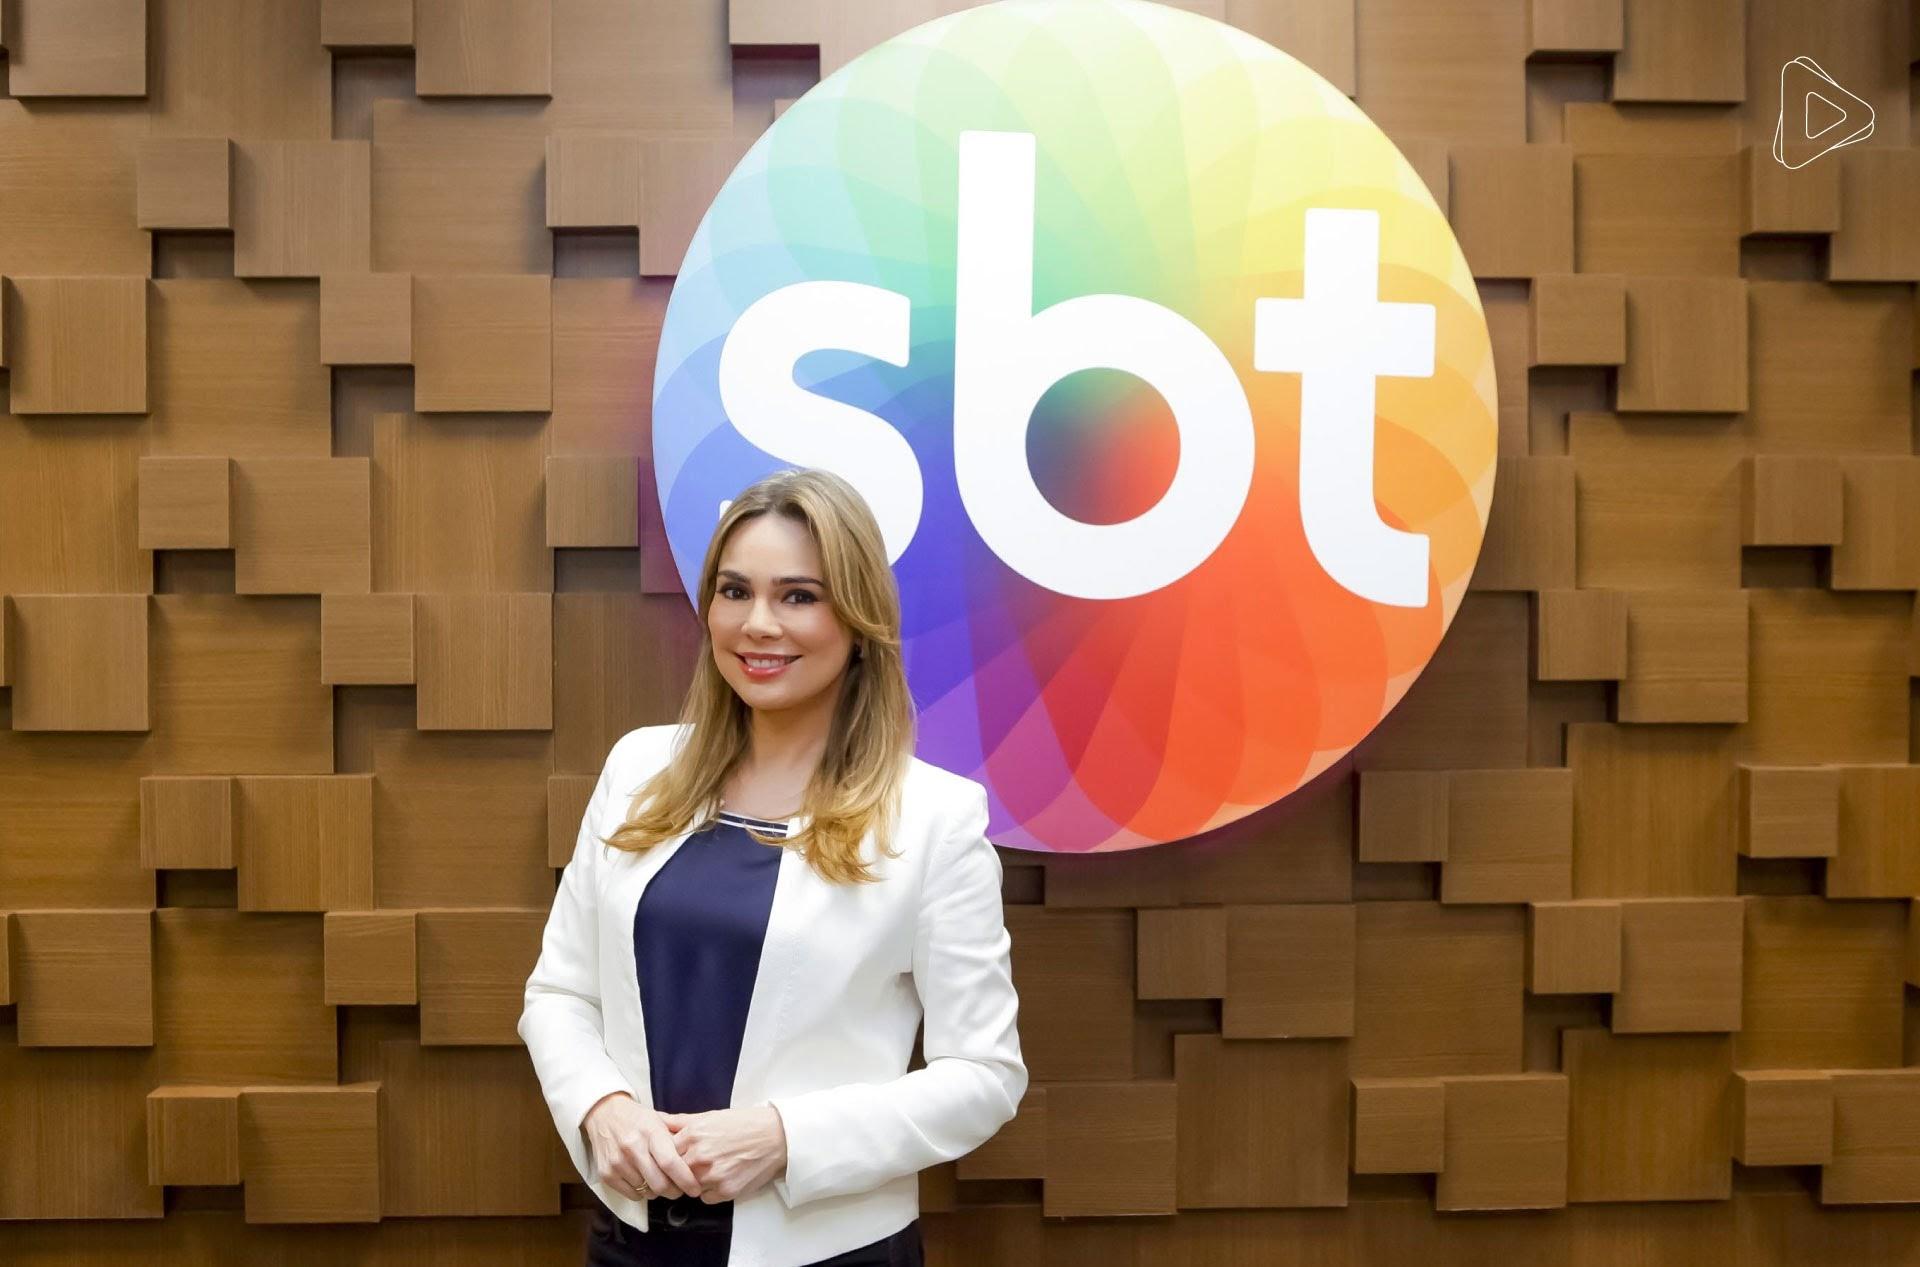 Rachel Sheherazade acaba de renovar contrato com o SBT